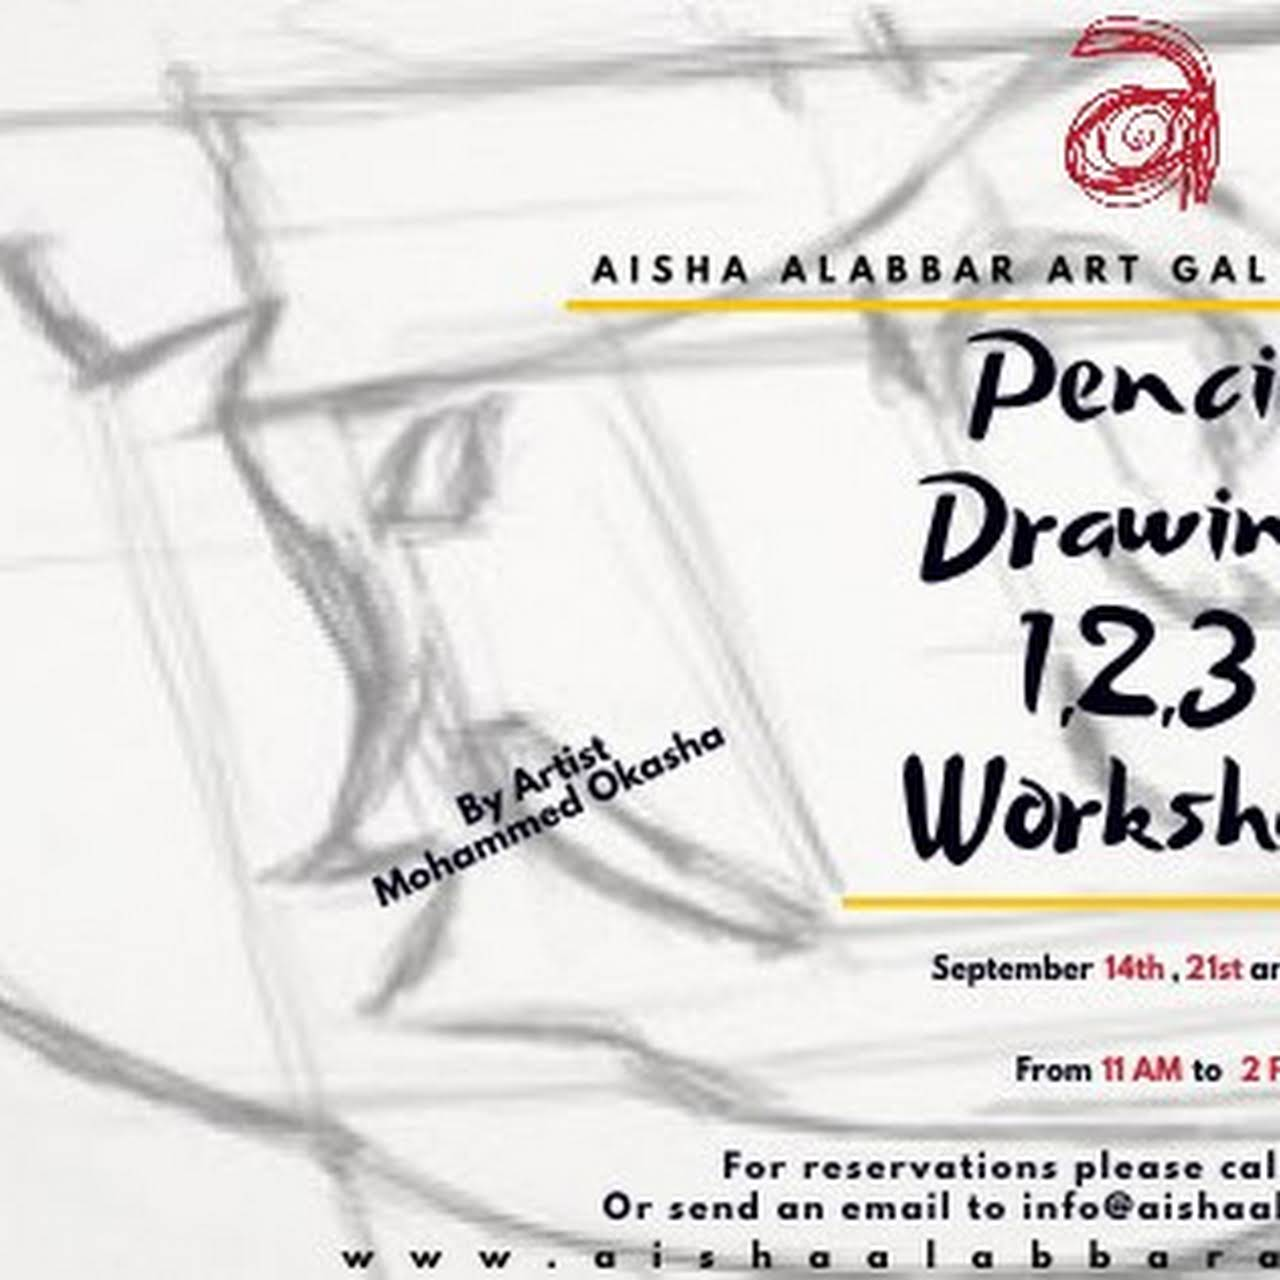 Aisha Alabbar Art Gallery in Dubai | Art Center | Art Events